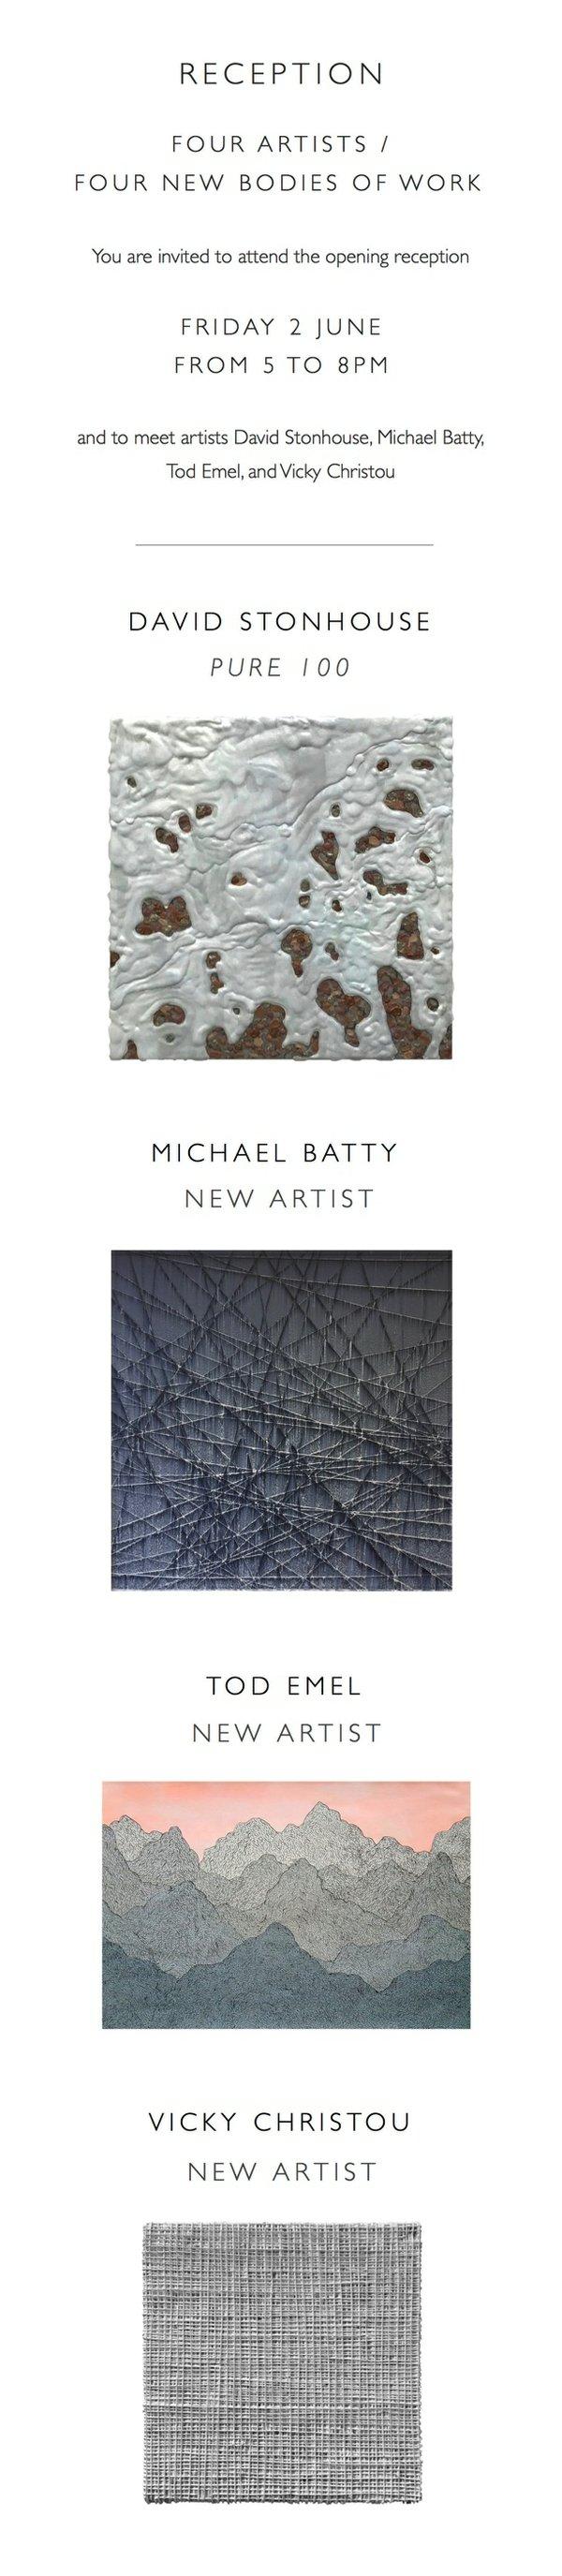 "David Stonhouse, Vicky Christou, Michael Batty, & Tod Emel, ""Invitation"""